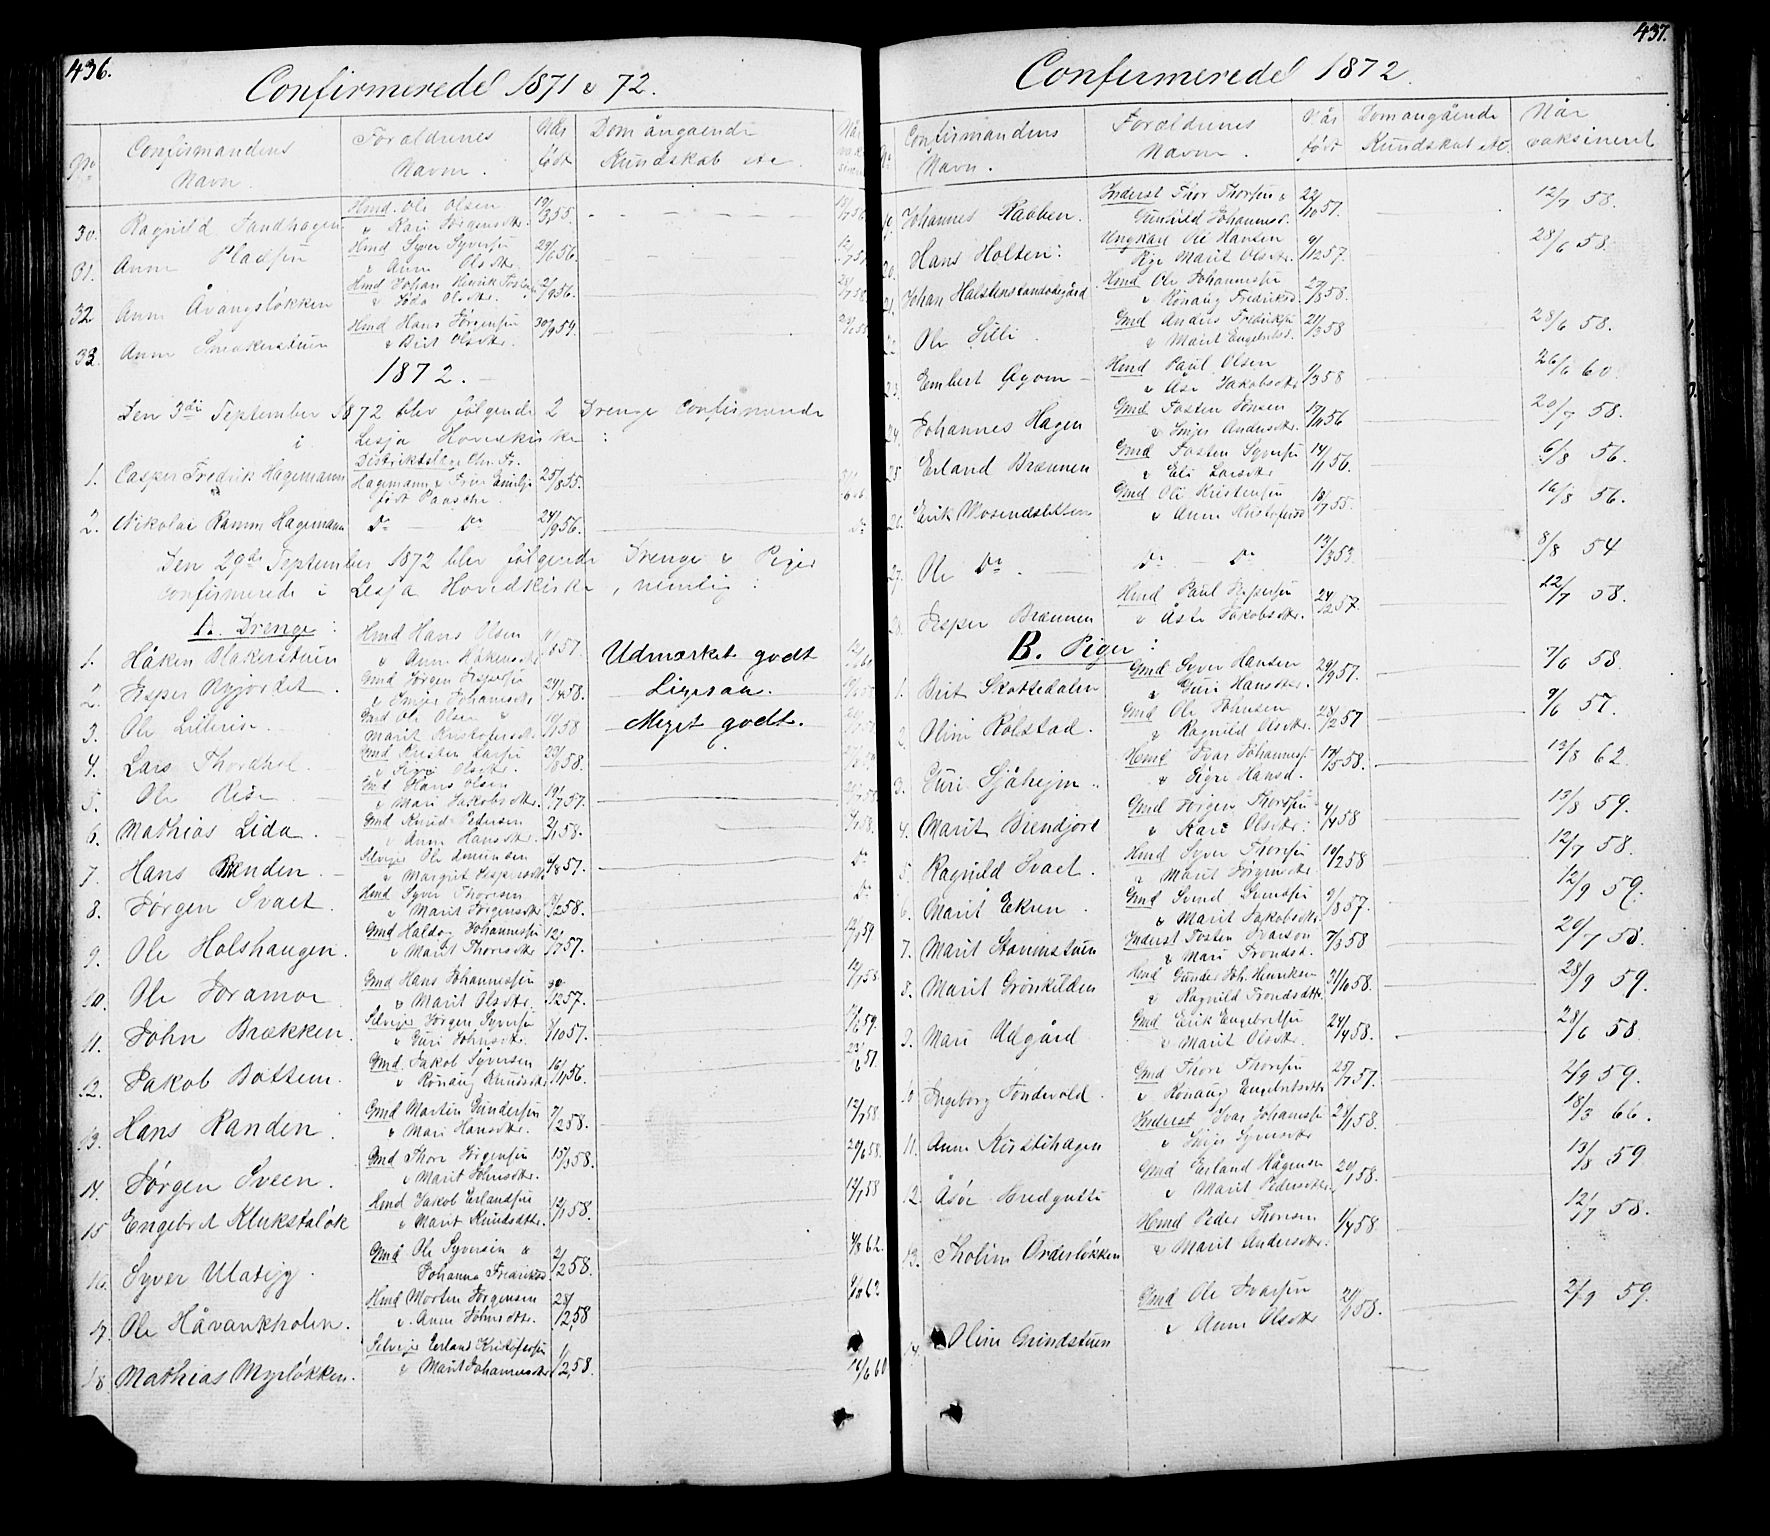 SAH, Lesja prestekontor, Klokkerbok nr. 5, 1850-1894, s. 436-437